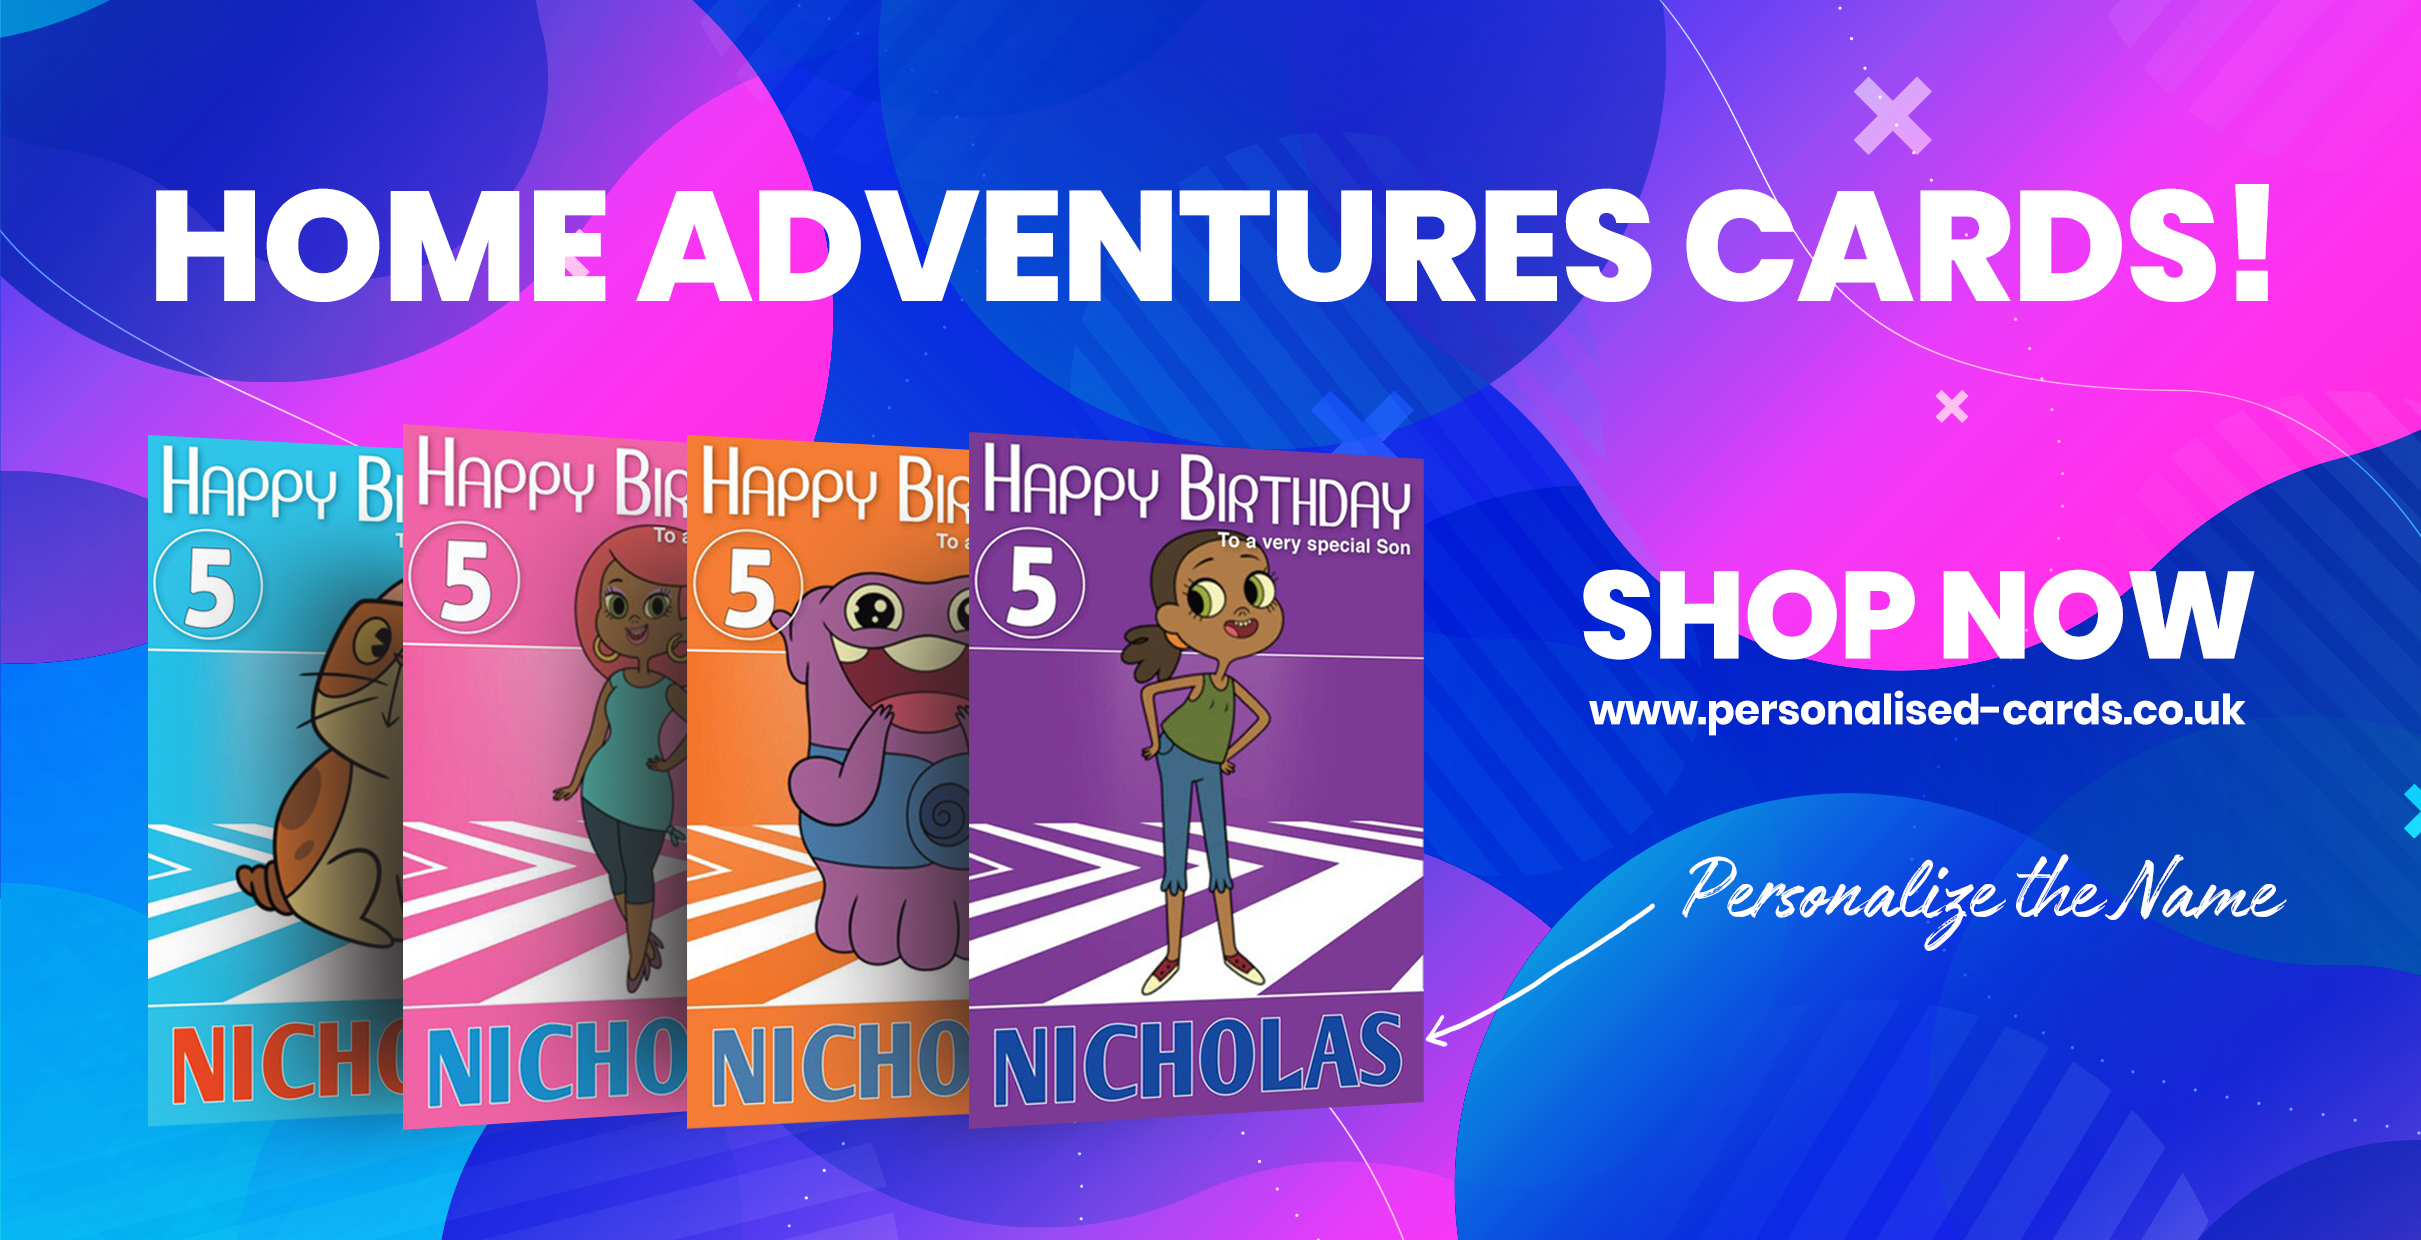 home-adventures-cards.jpg